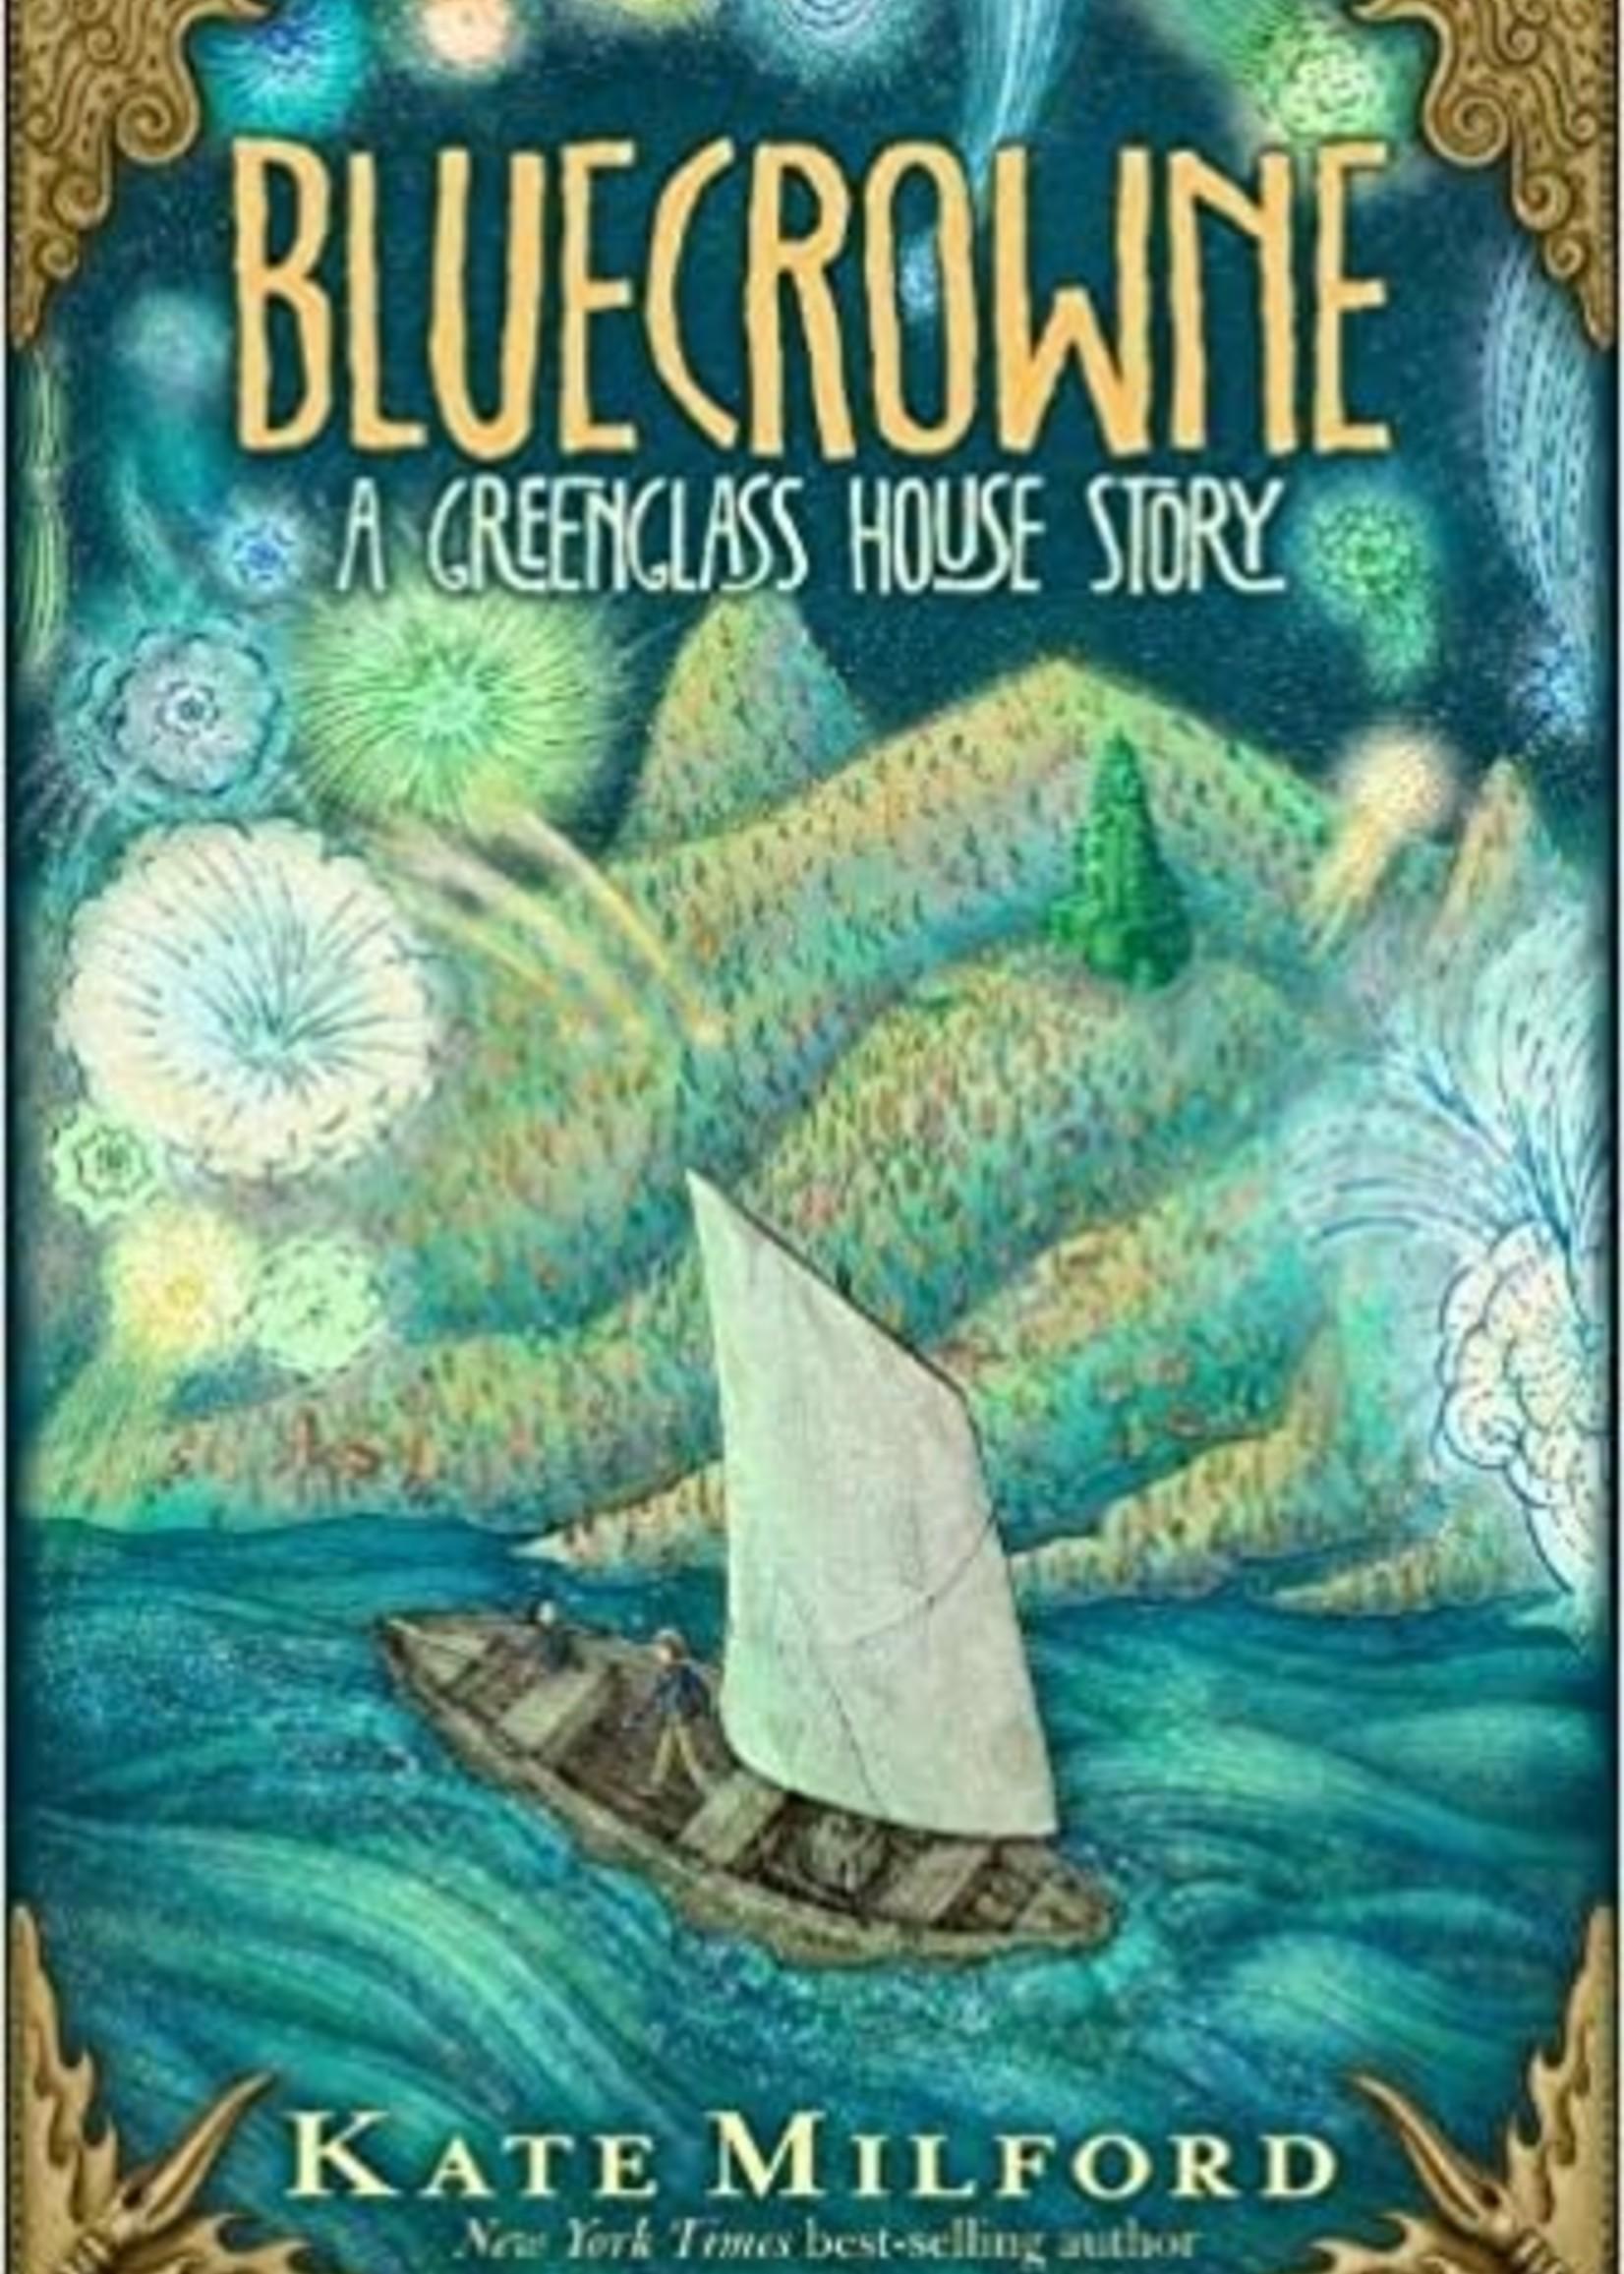 Greenglass House #03, Bluecrowne - Paperback